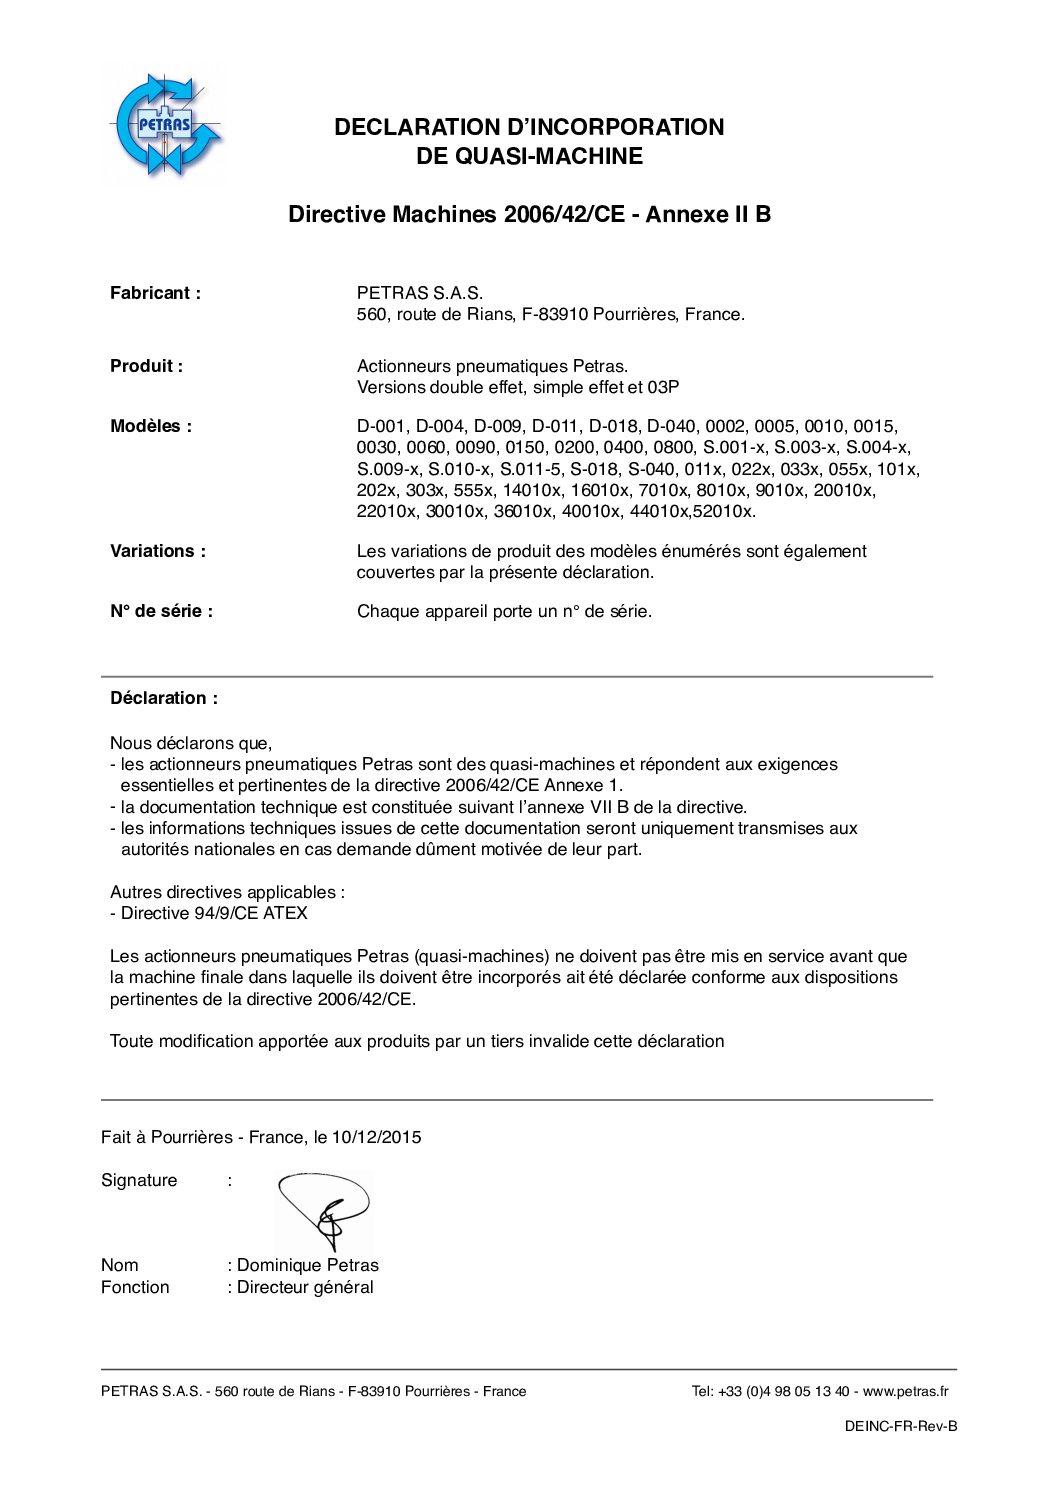 directive 2006/42/CE